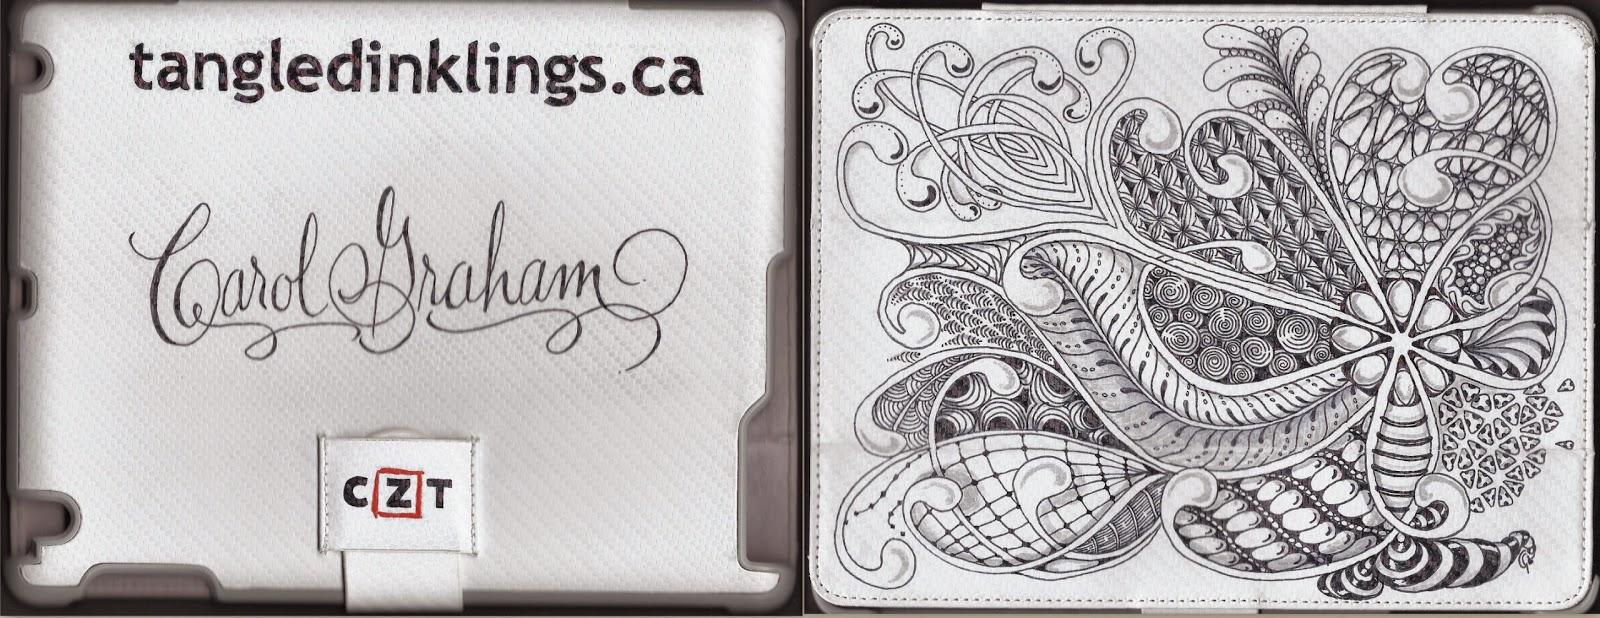 tangledinklings.ca, Carol Graham CZT12, Tangled Inklings